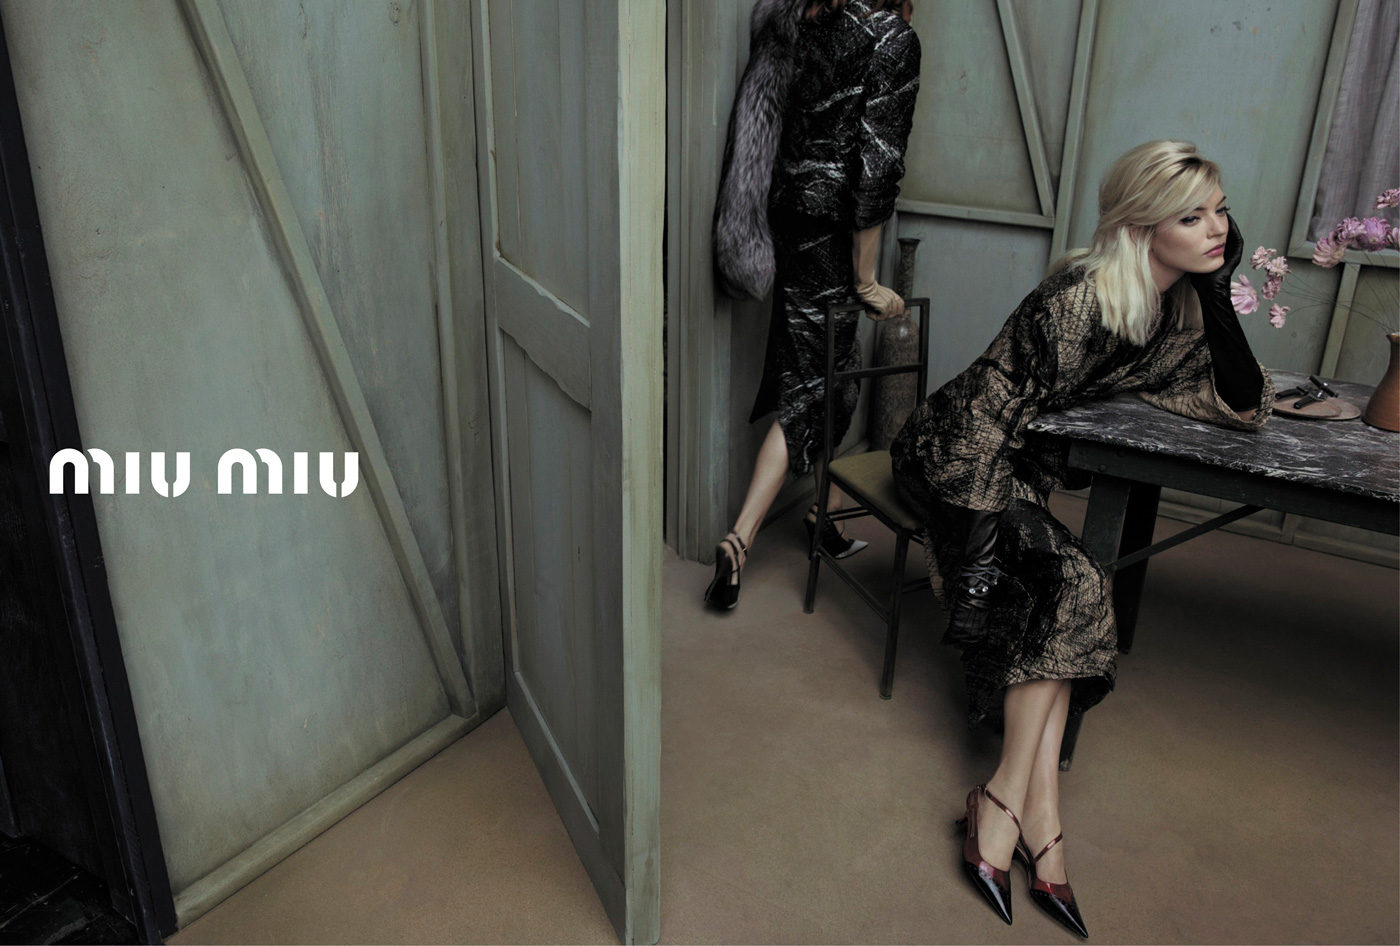 aa5652886468 Miu Miu Spring Summer 2013 Campaign by Inez   Vinoodh